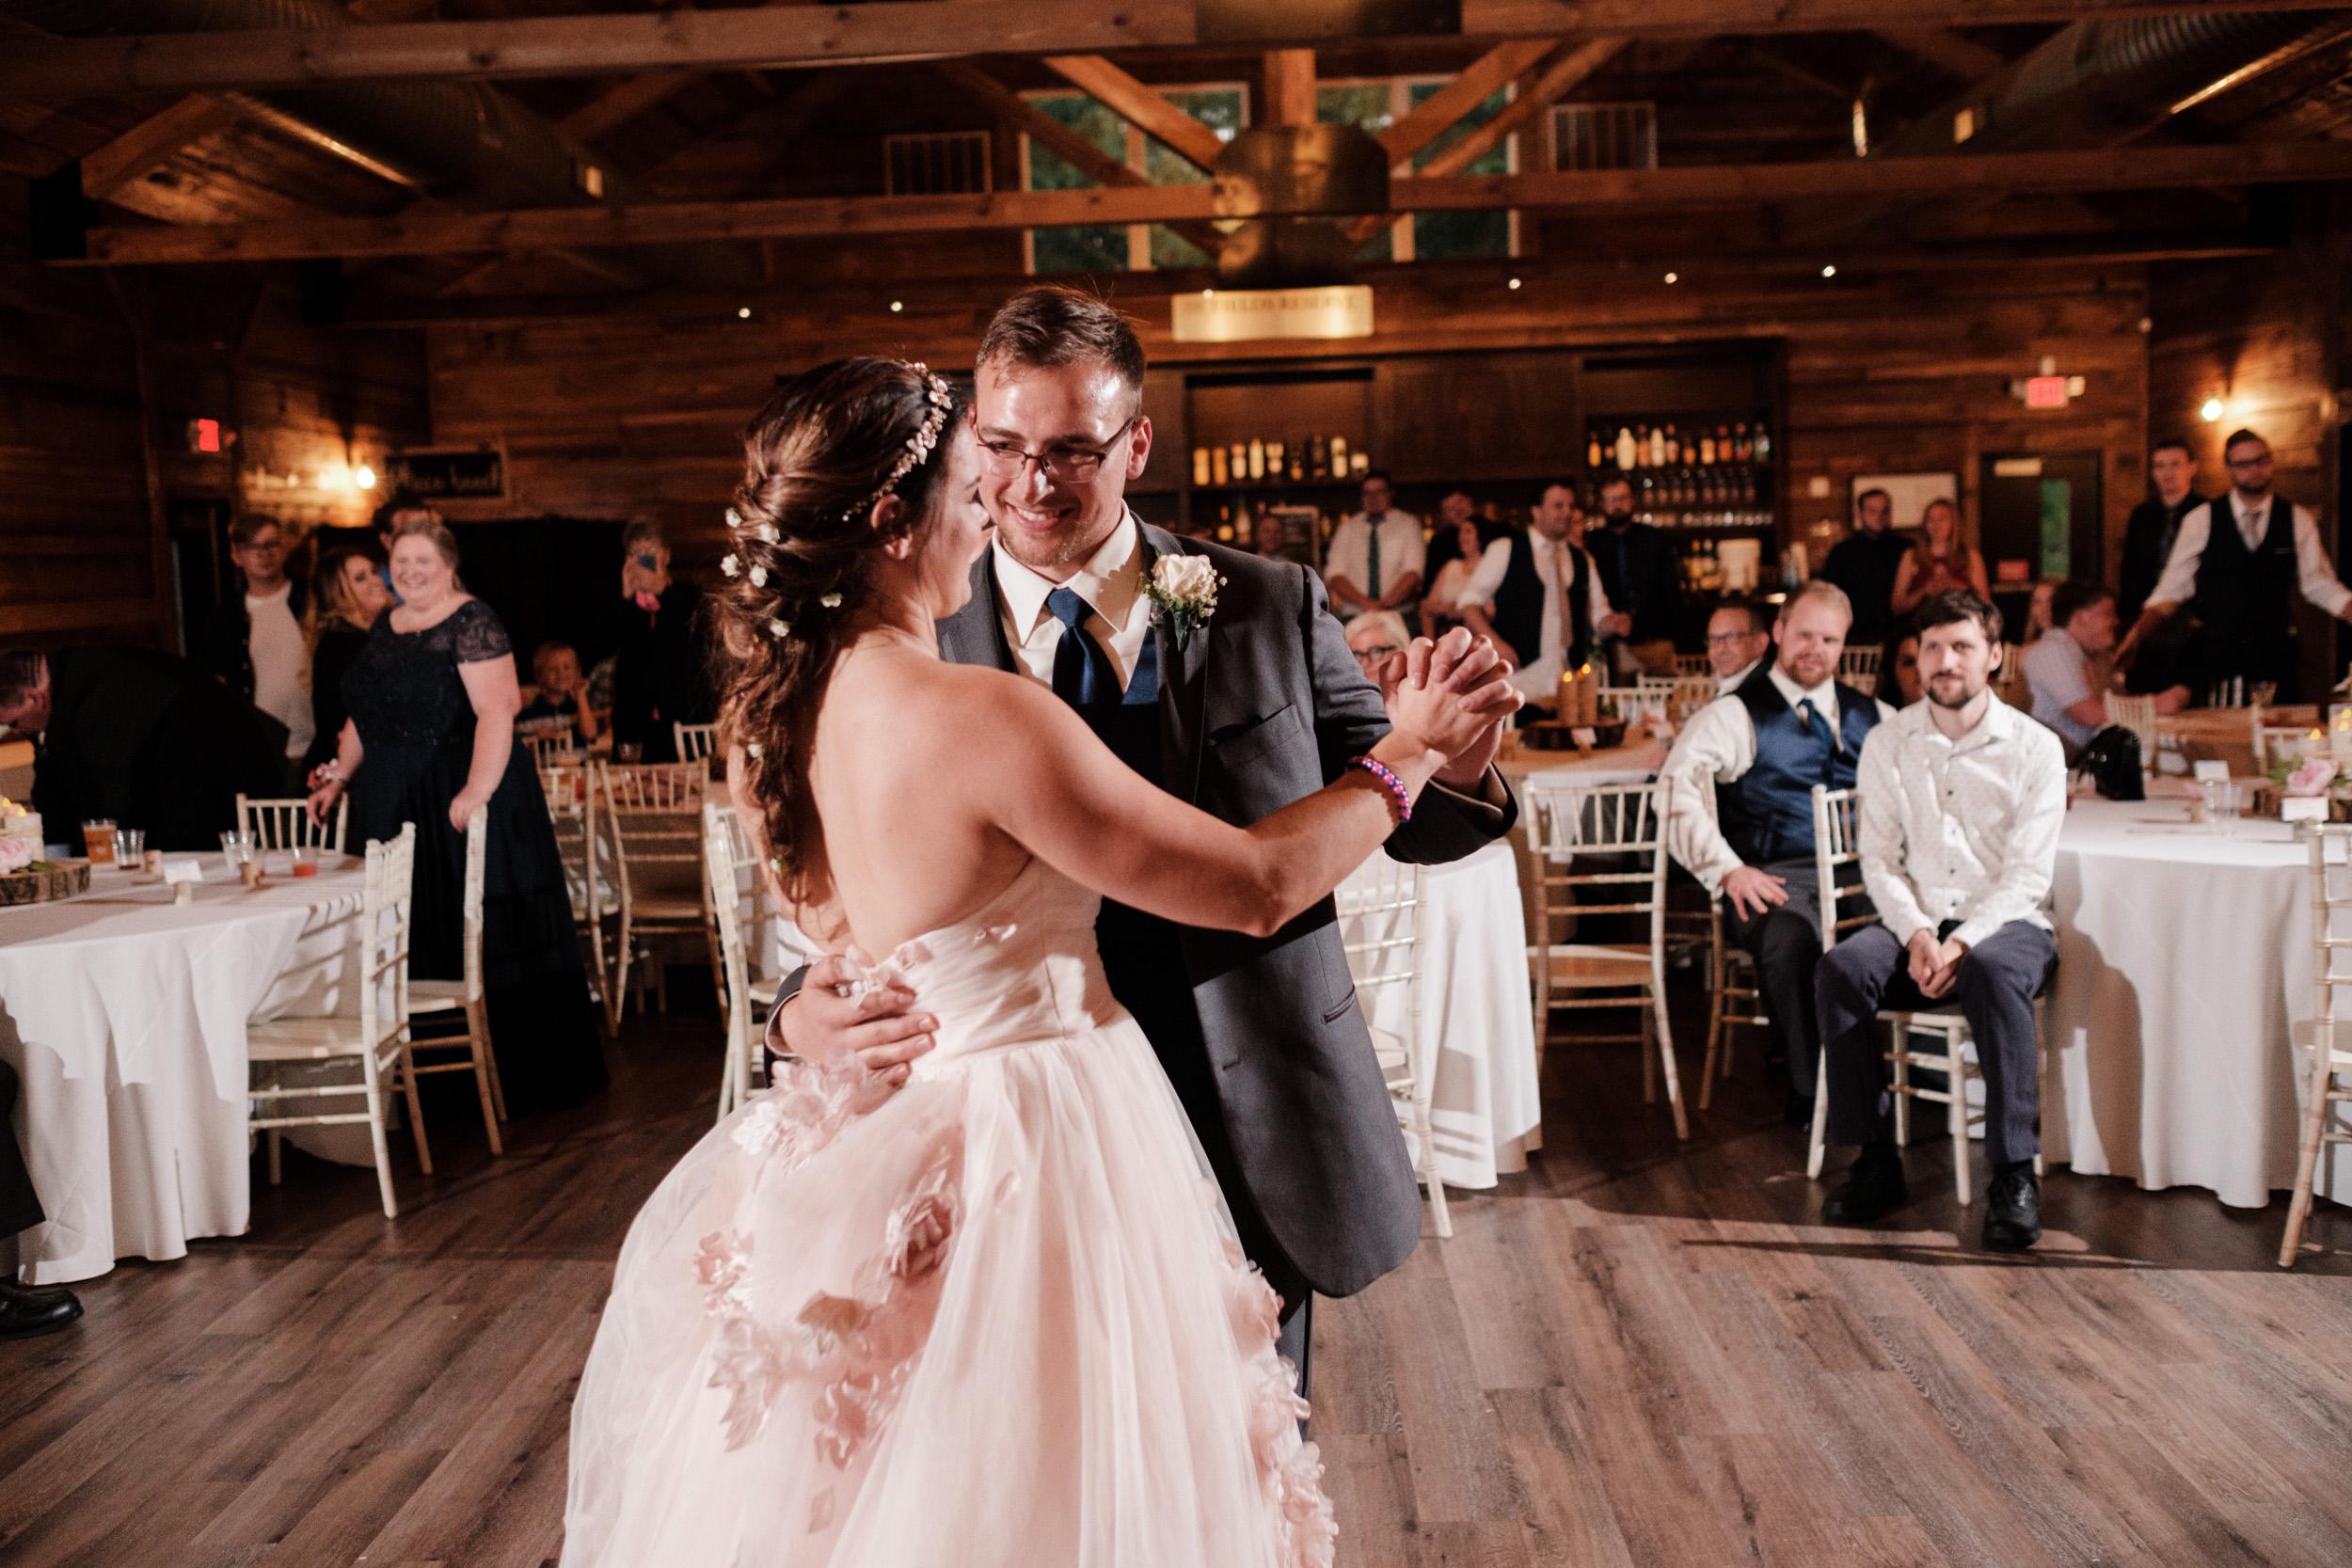 19-06-22-Ryan-Katie-The-Fields-Reserve-Wedding-72.jpg